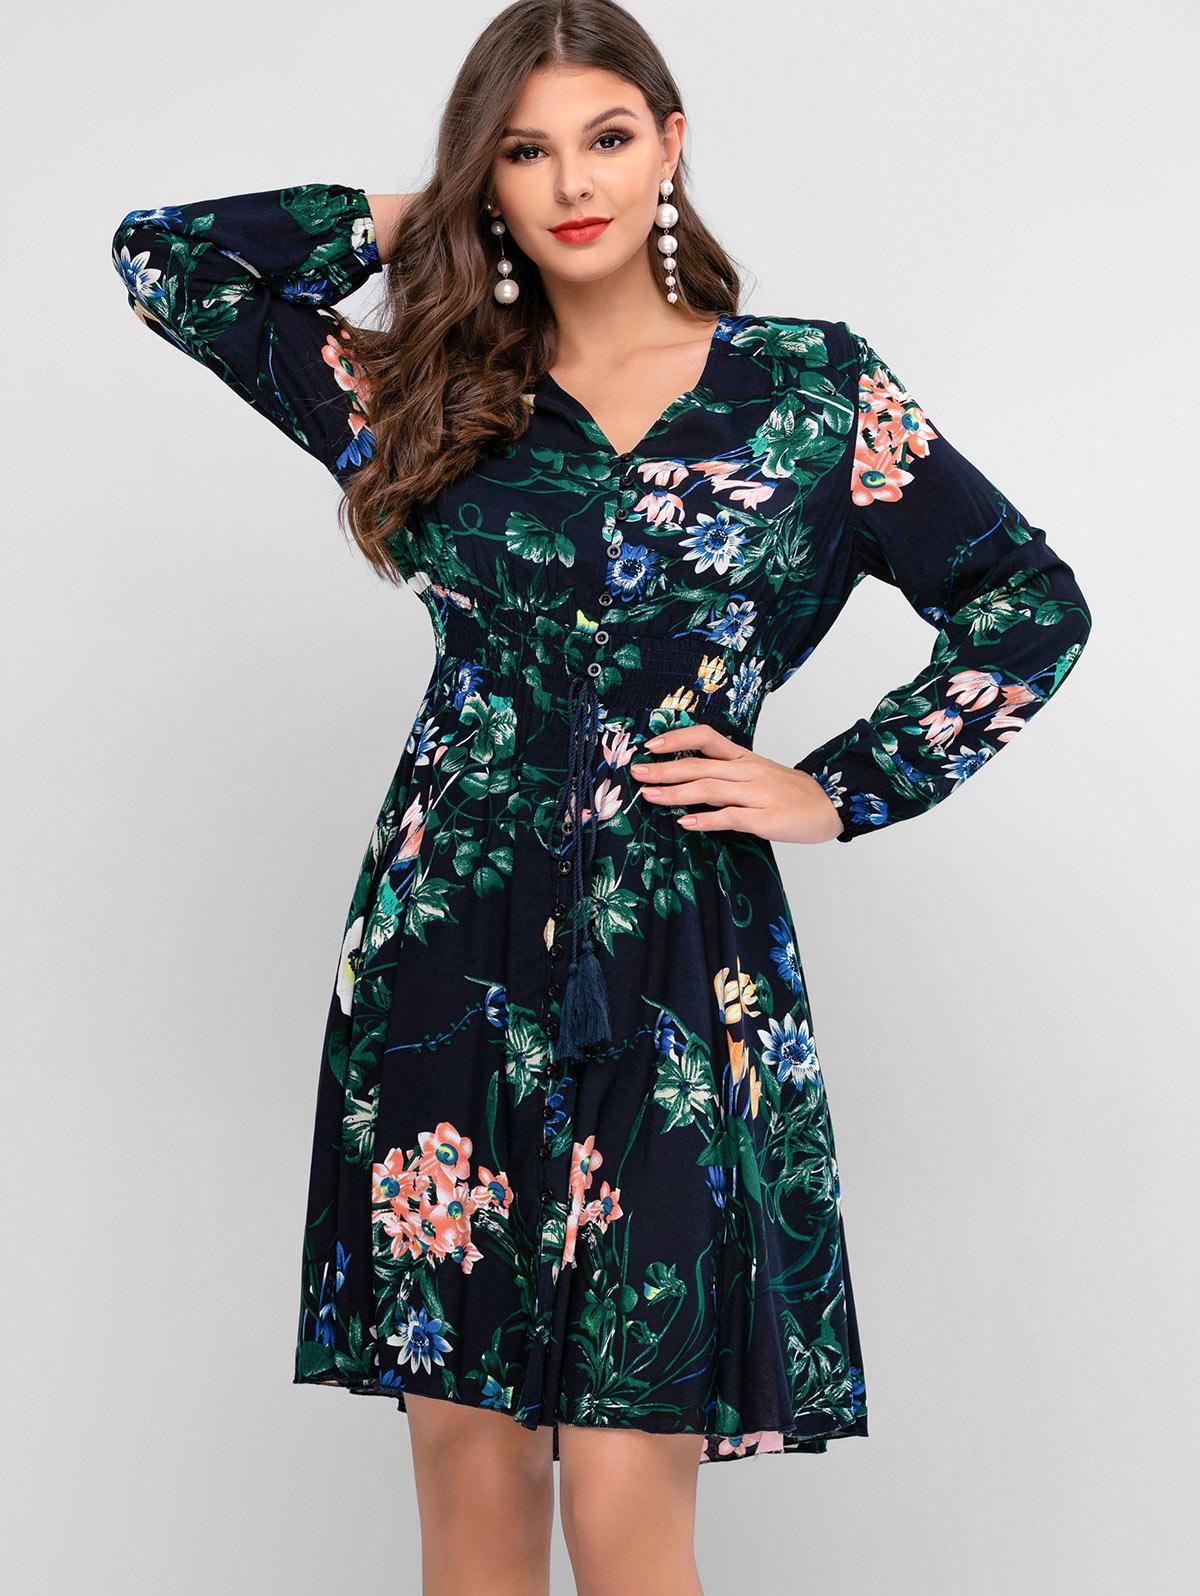 ZAFUL Button Loop Floral Tassels Long Sleeve Dress